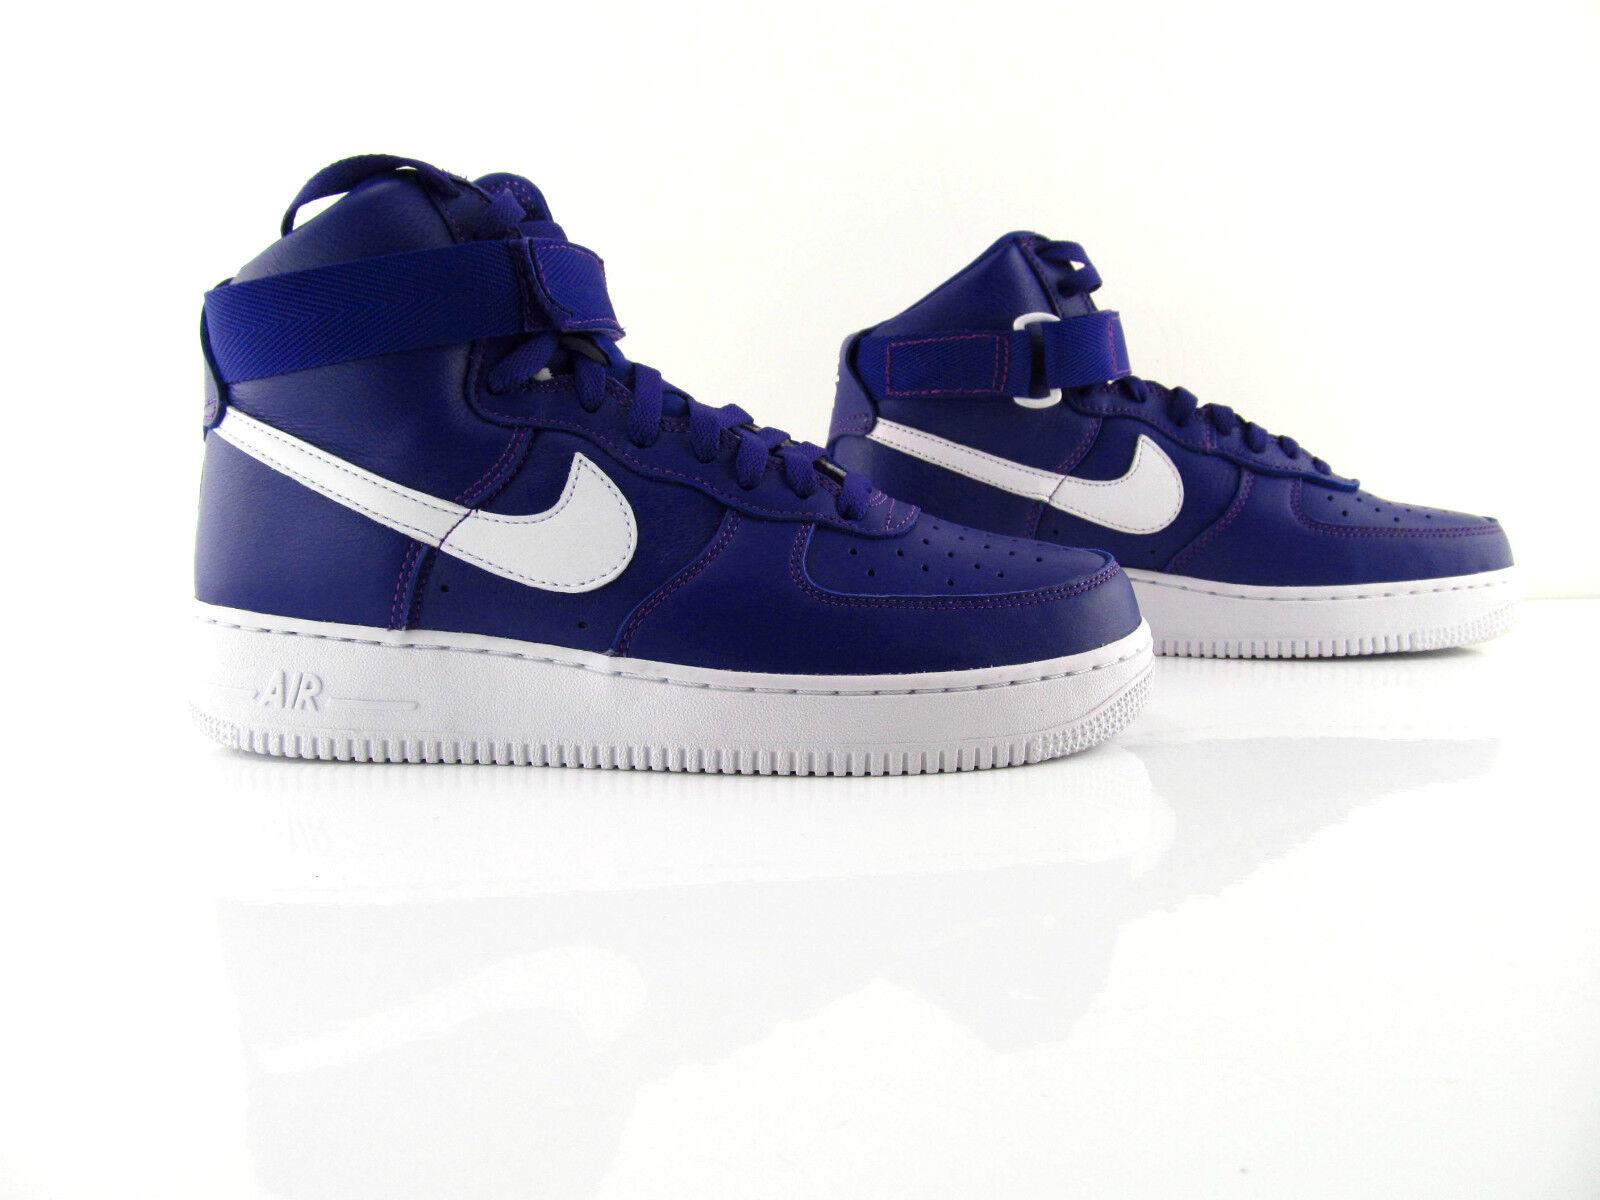 Nike Air Eur Forde 1 Nikelab Violet blanc UK_7 US_8 Eur Air 41 4cb7e9